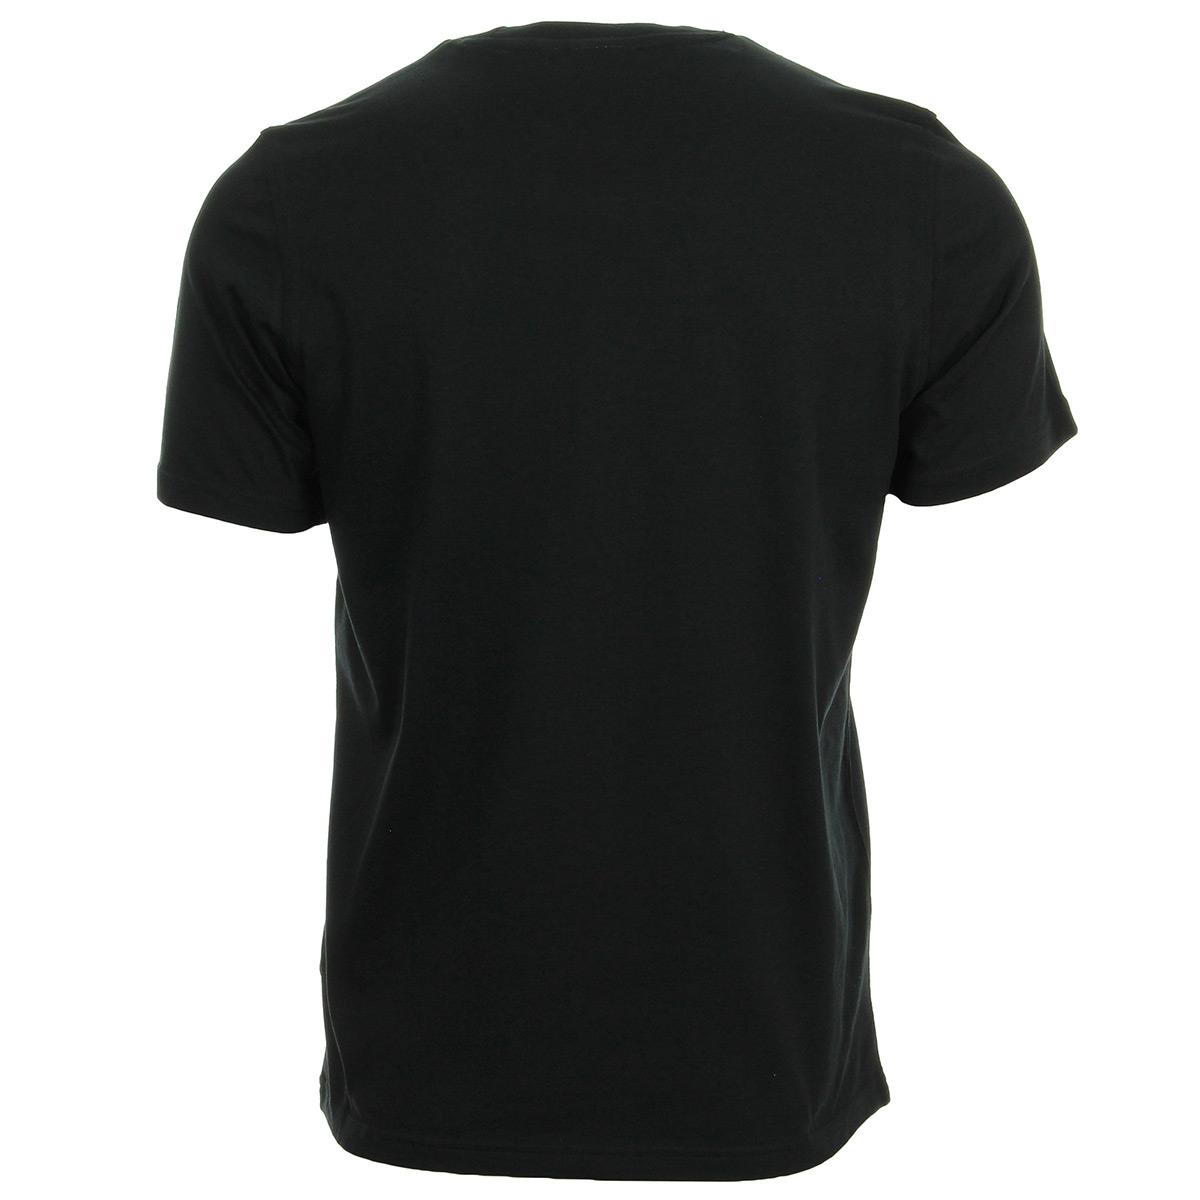 adidas Trefoil T shirt CW0709, T-Shirts homme